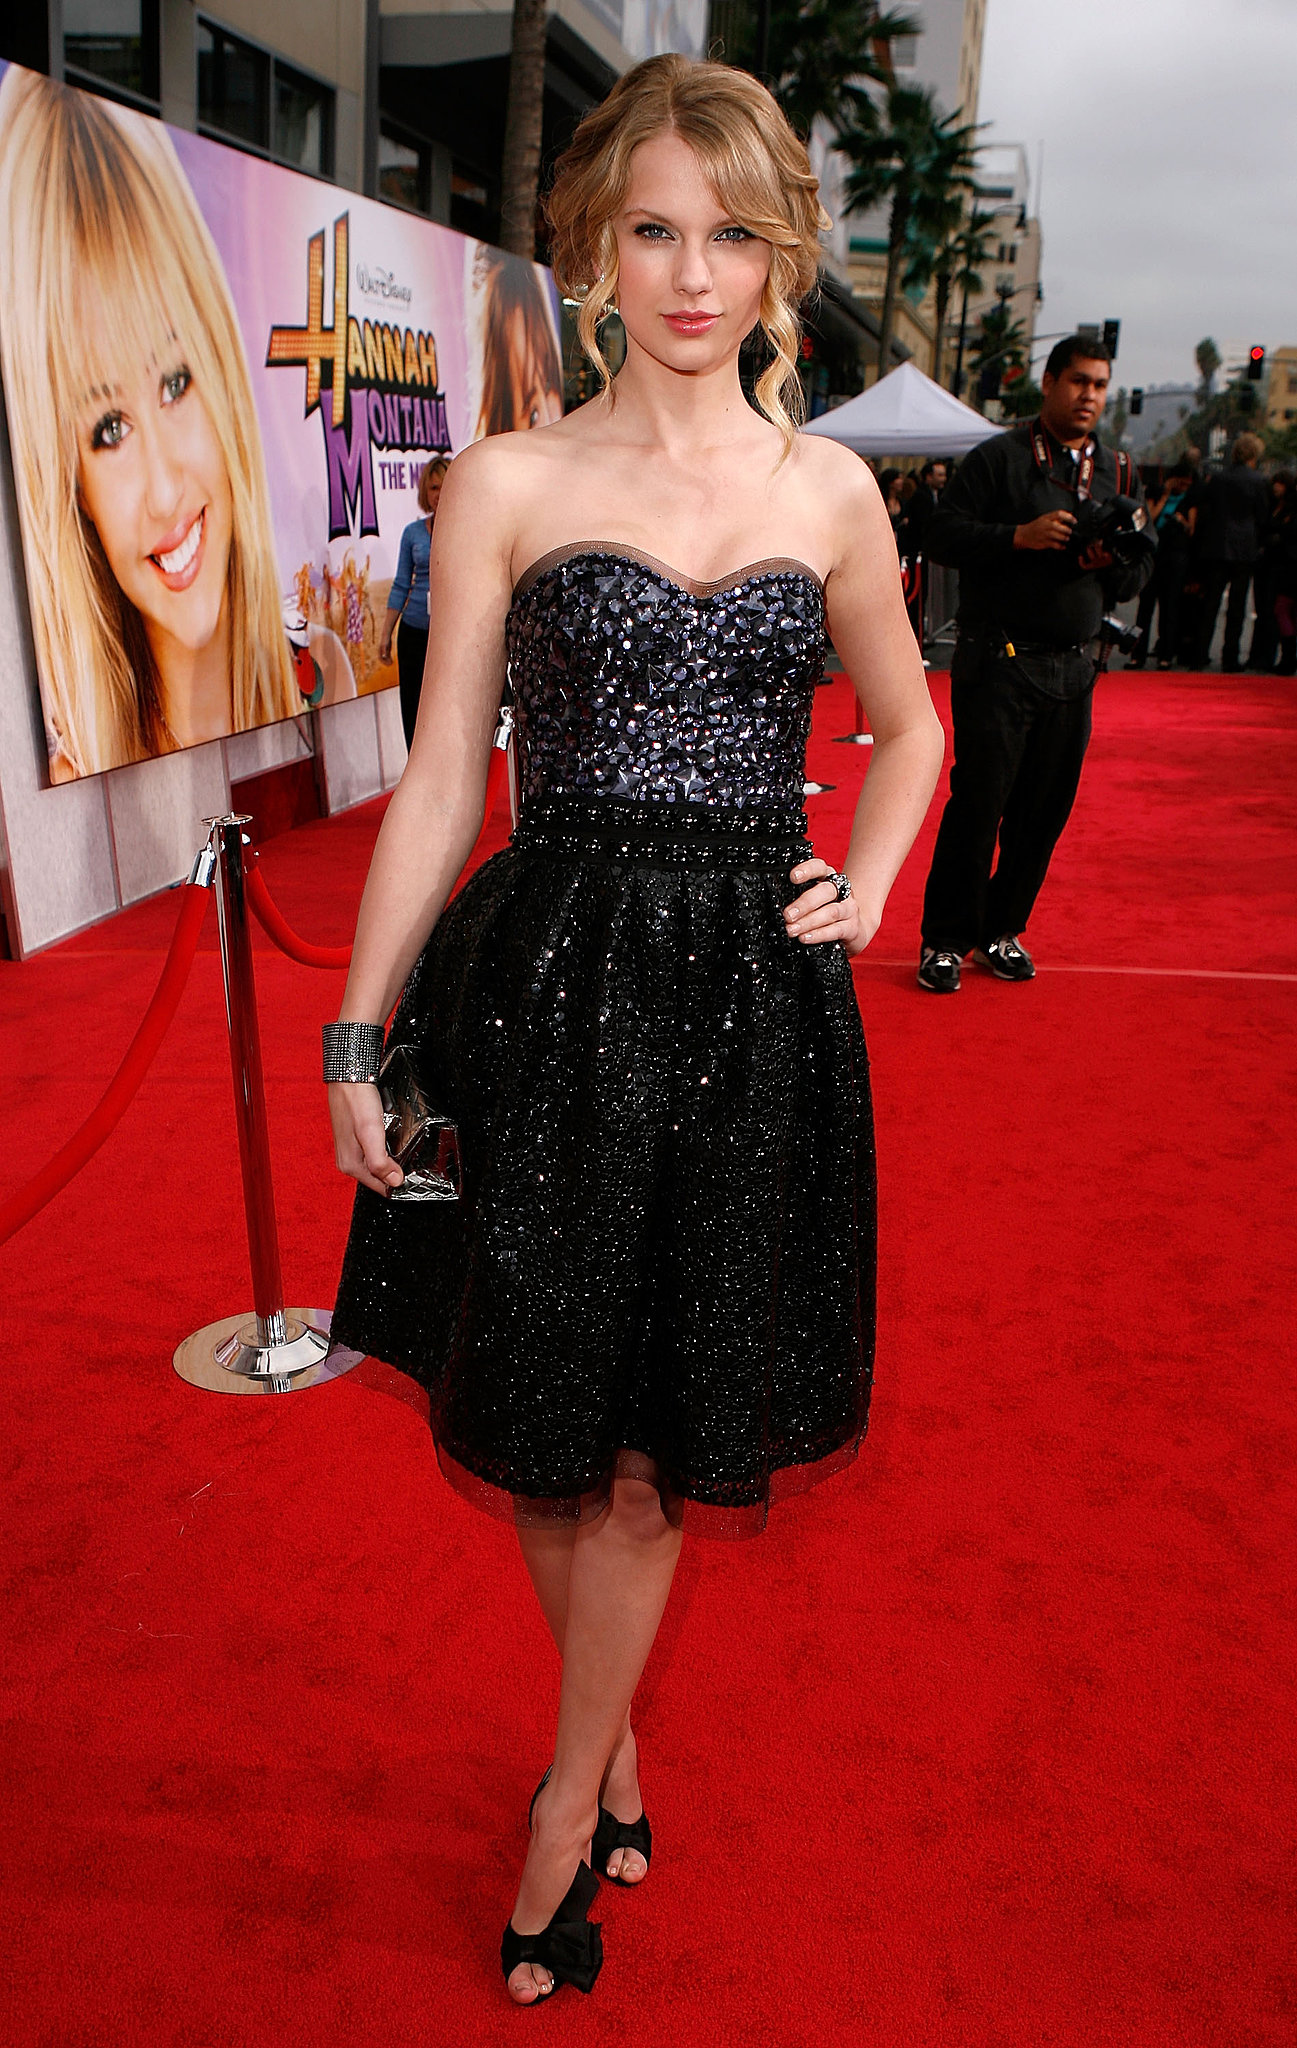 Hannah montana red dress